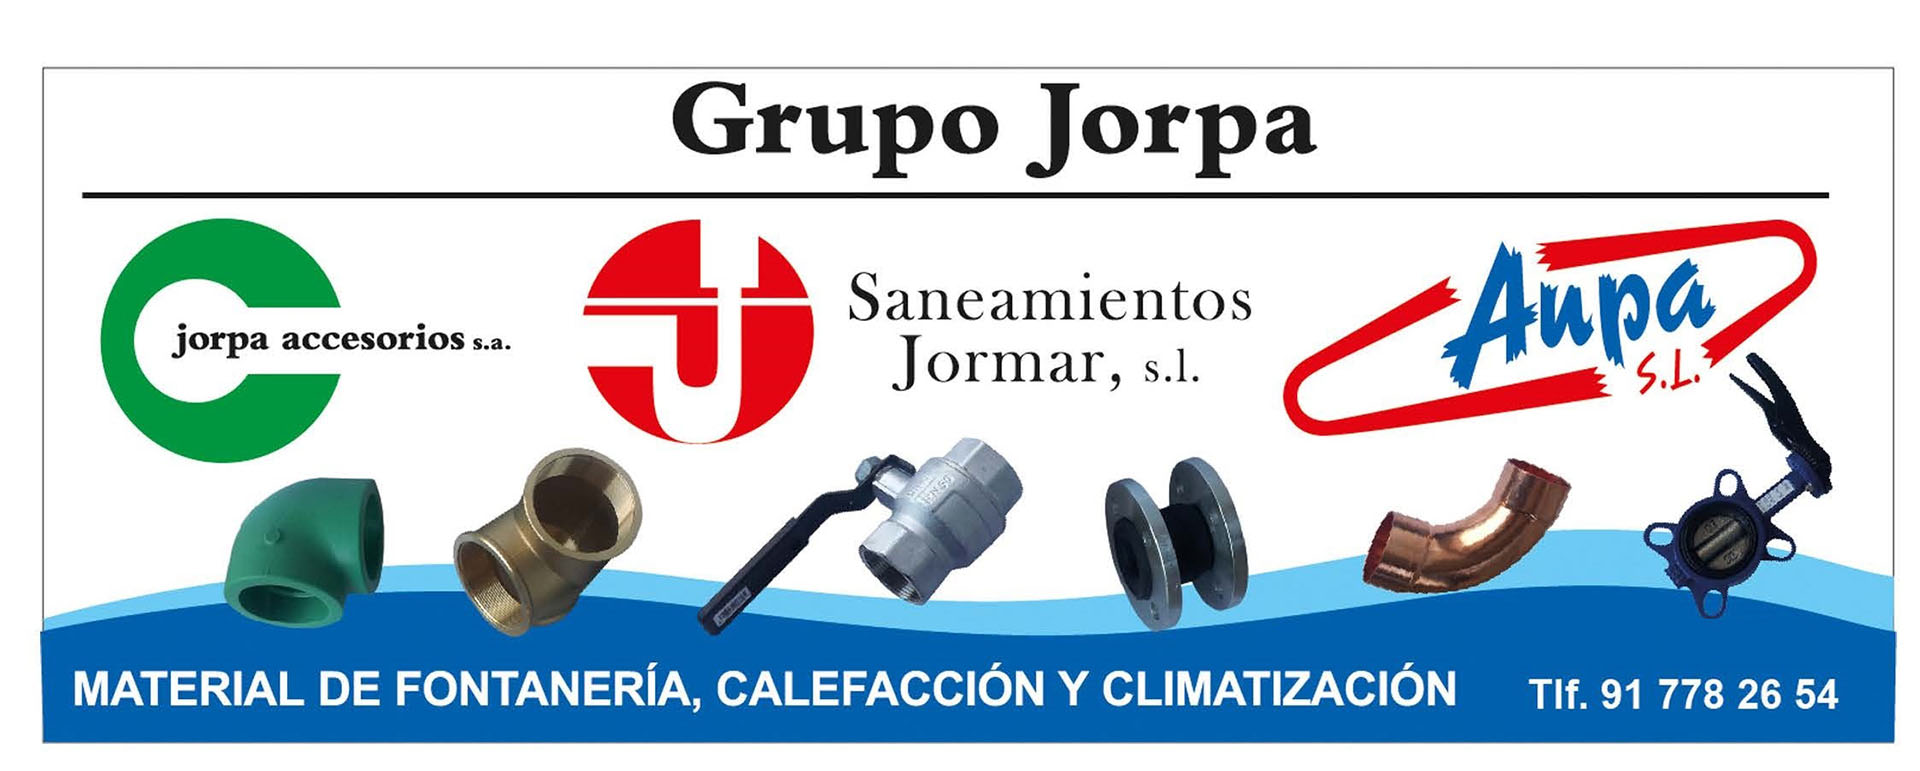 Grupo JORPA